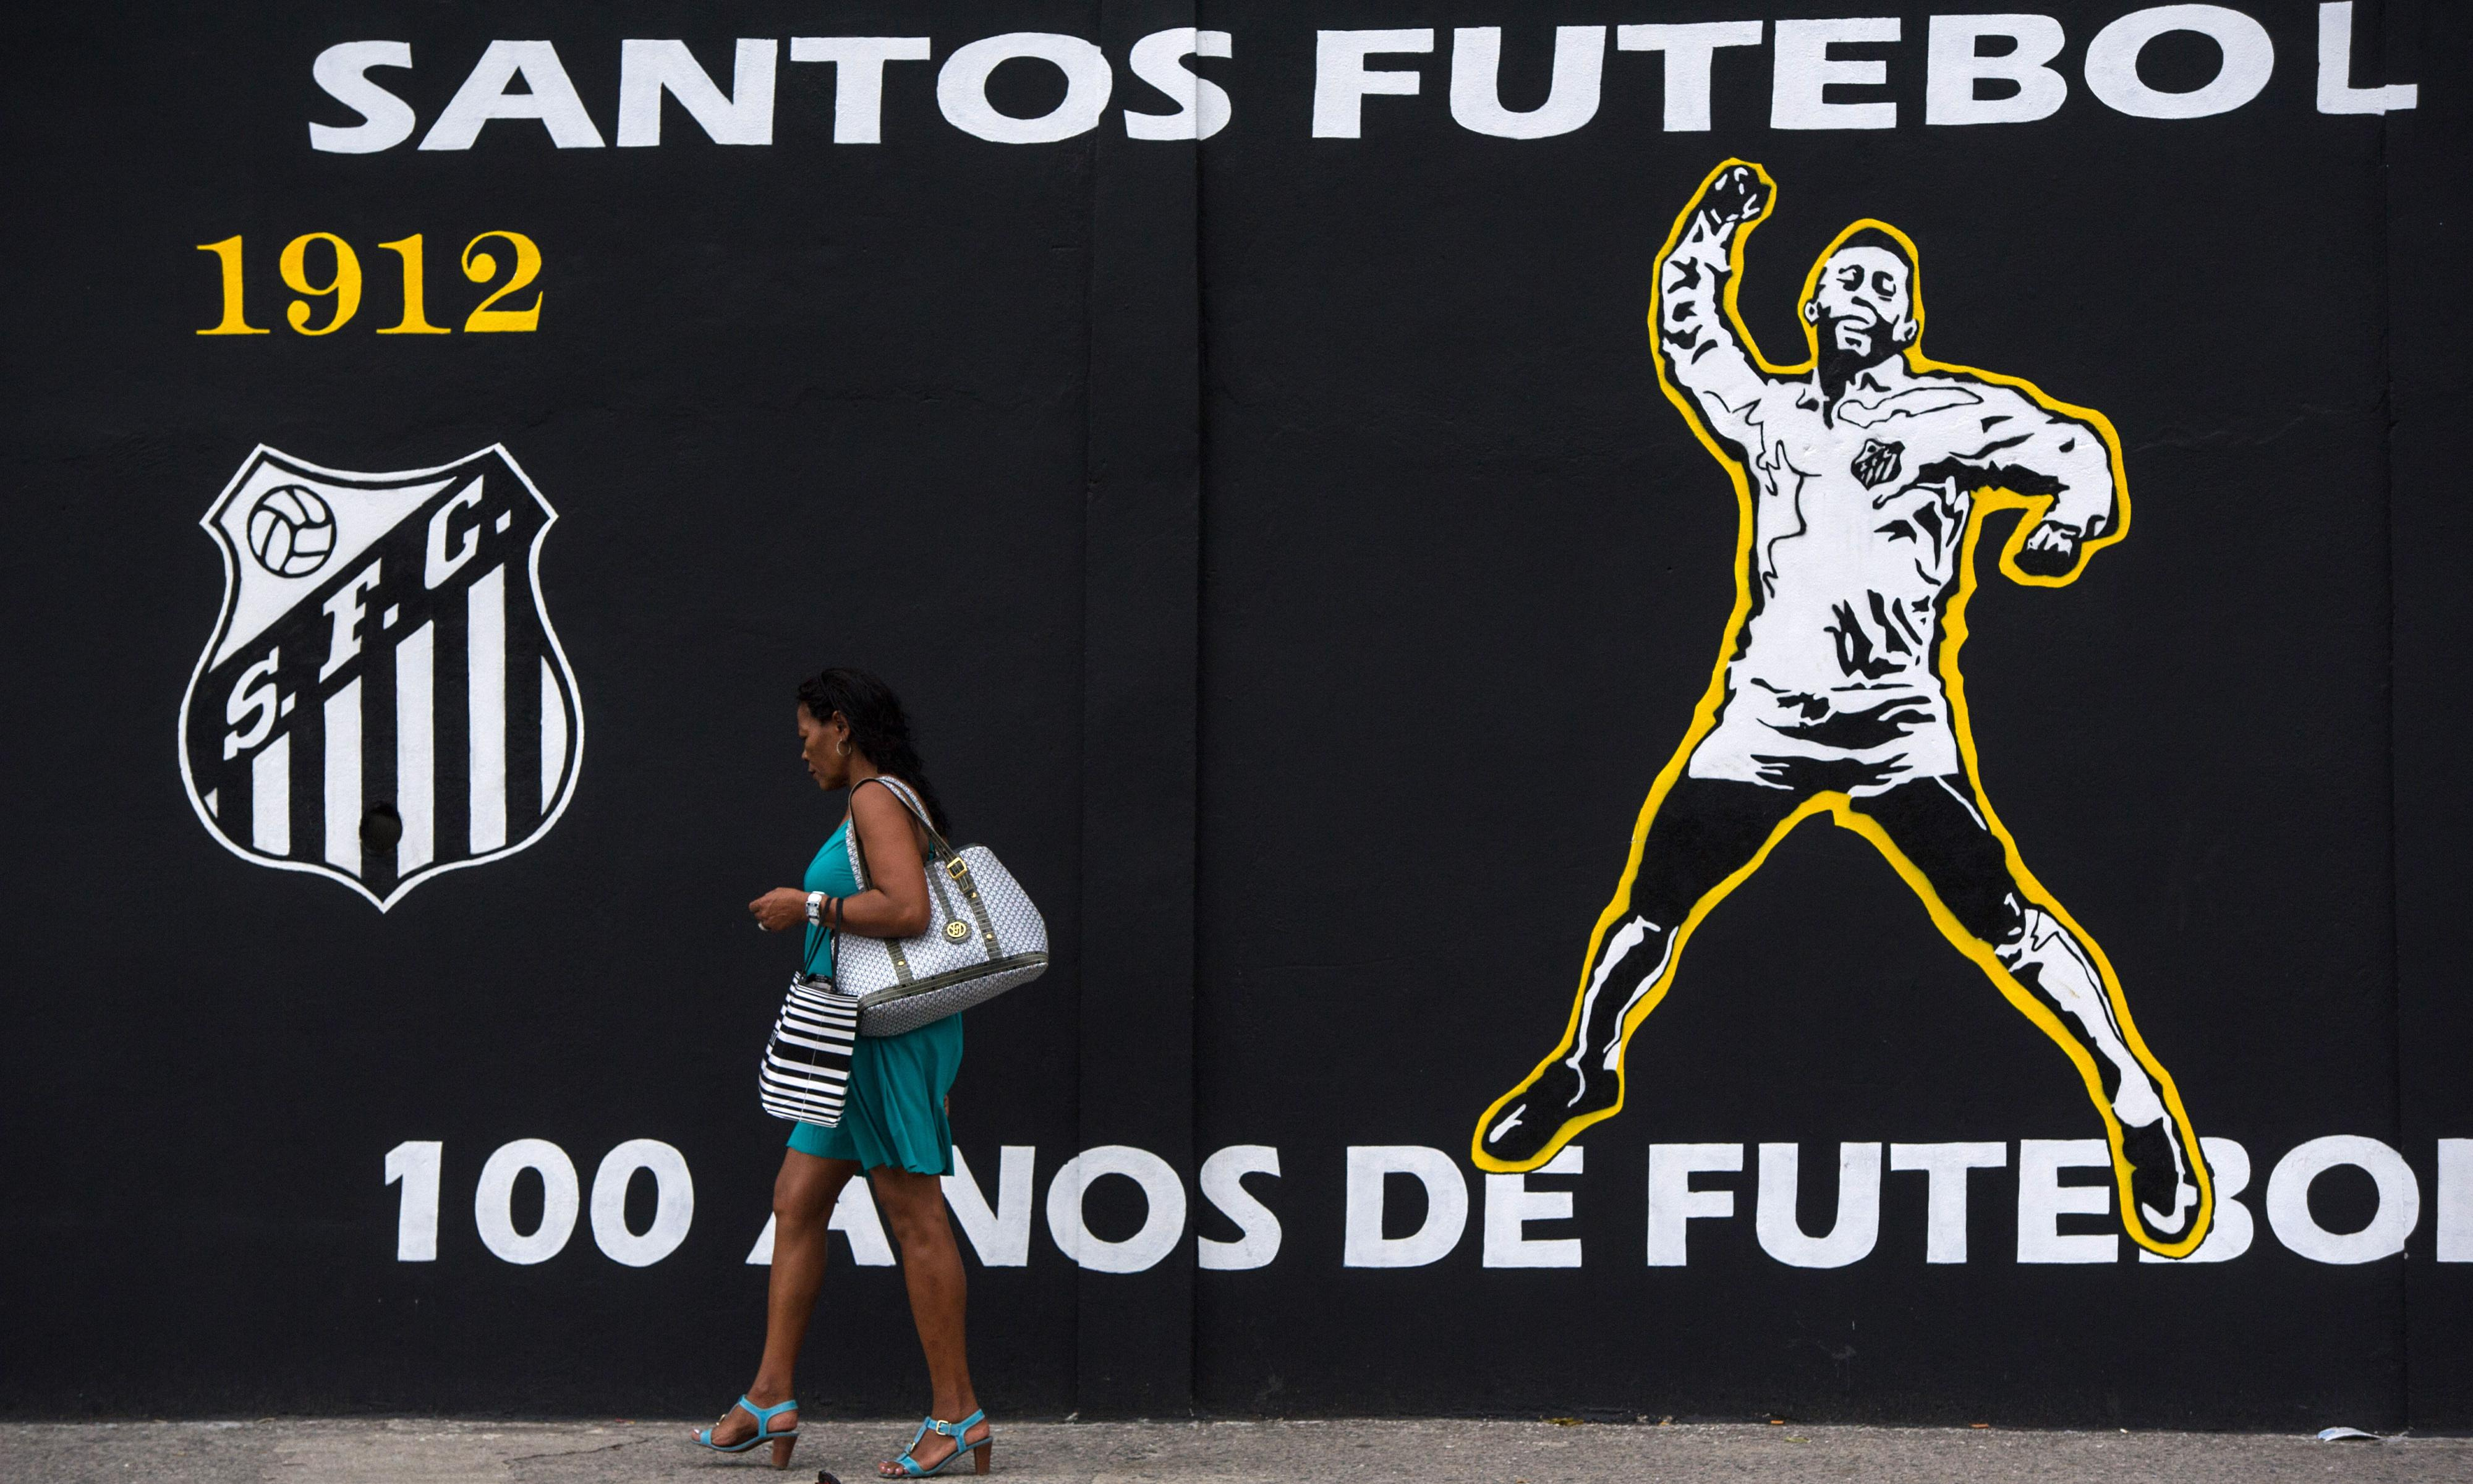 'This is the reality': Brazilian women's football team sleep in hotel lobby